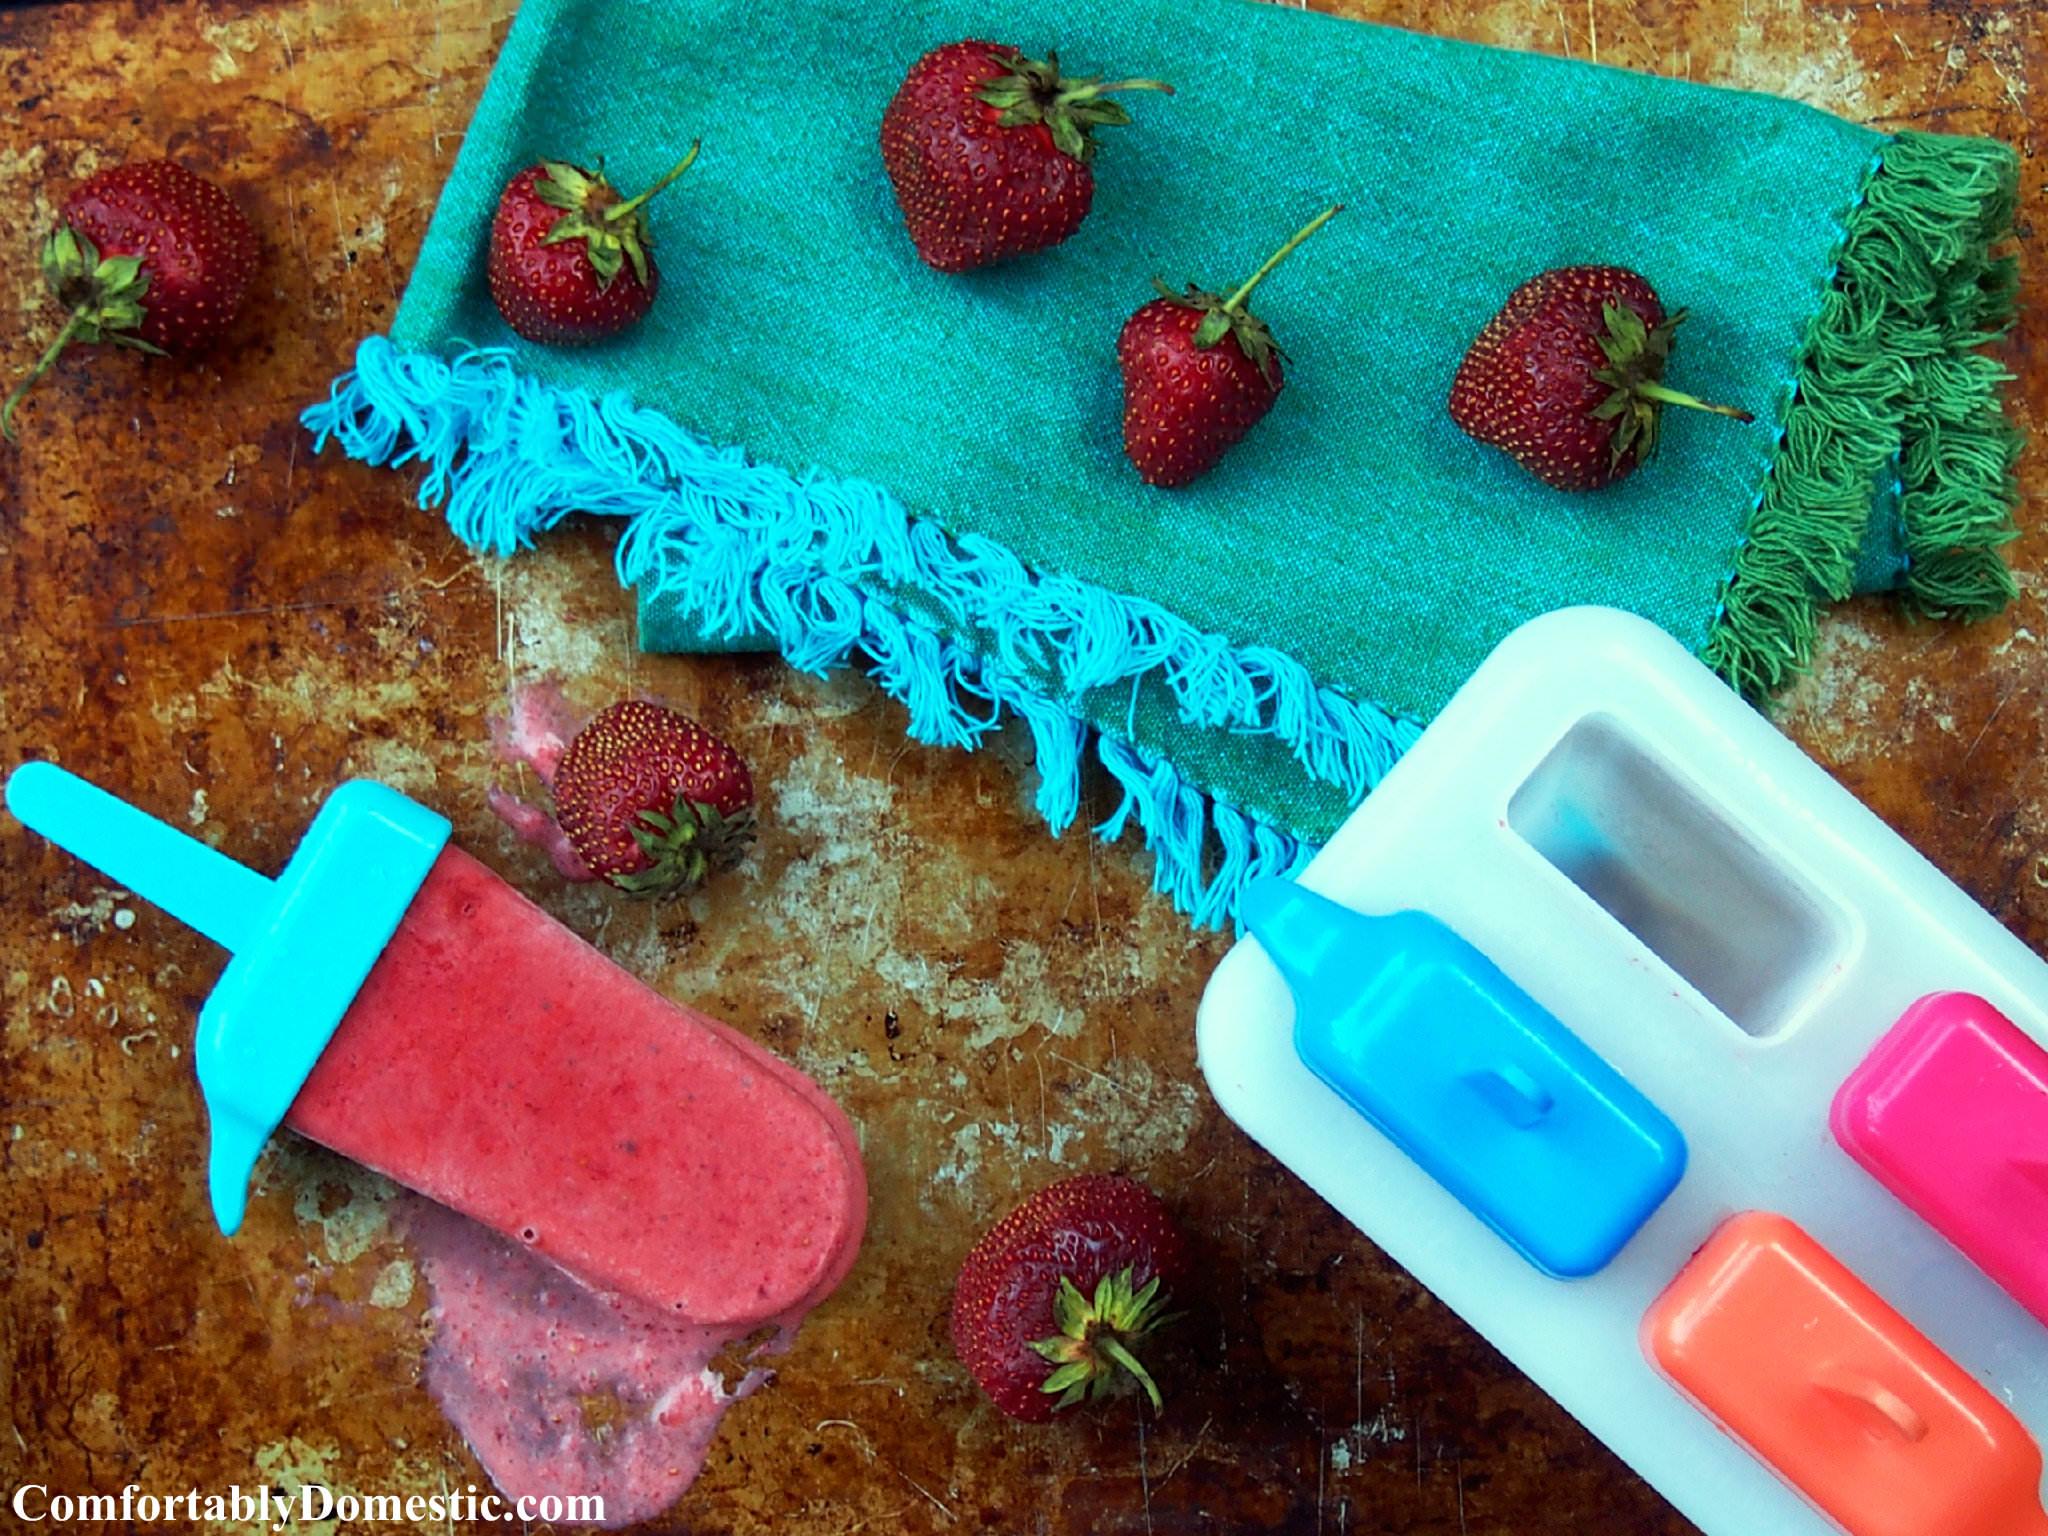 Strawberries and Cream Frozen Fruit Bars | ComfortablyDomestic.com